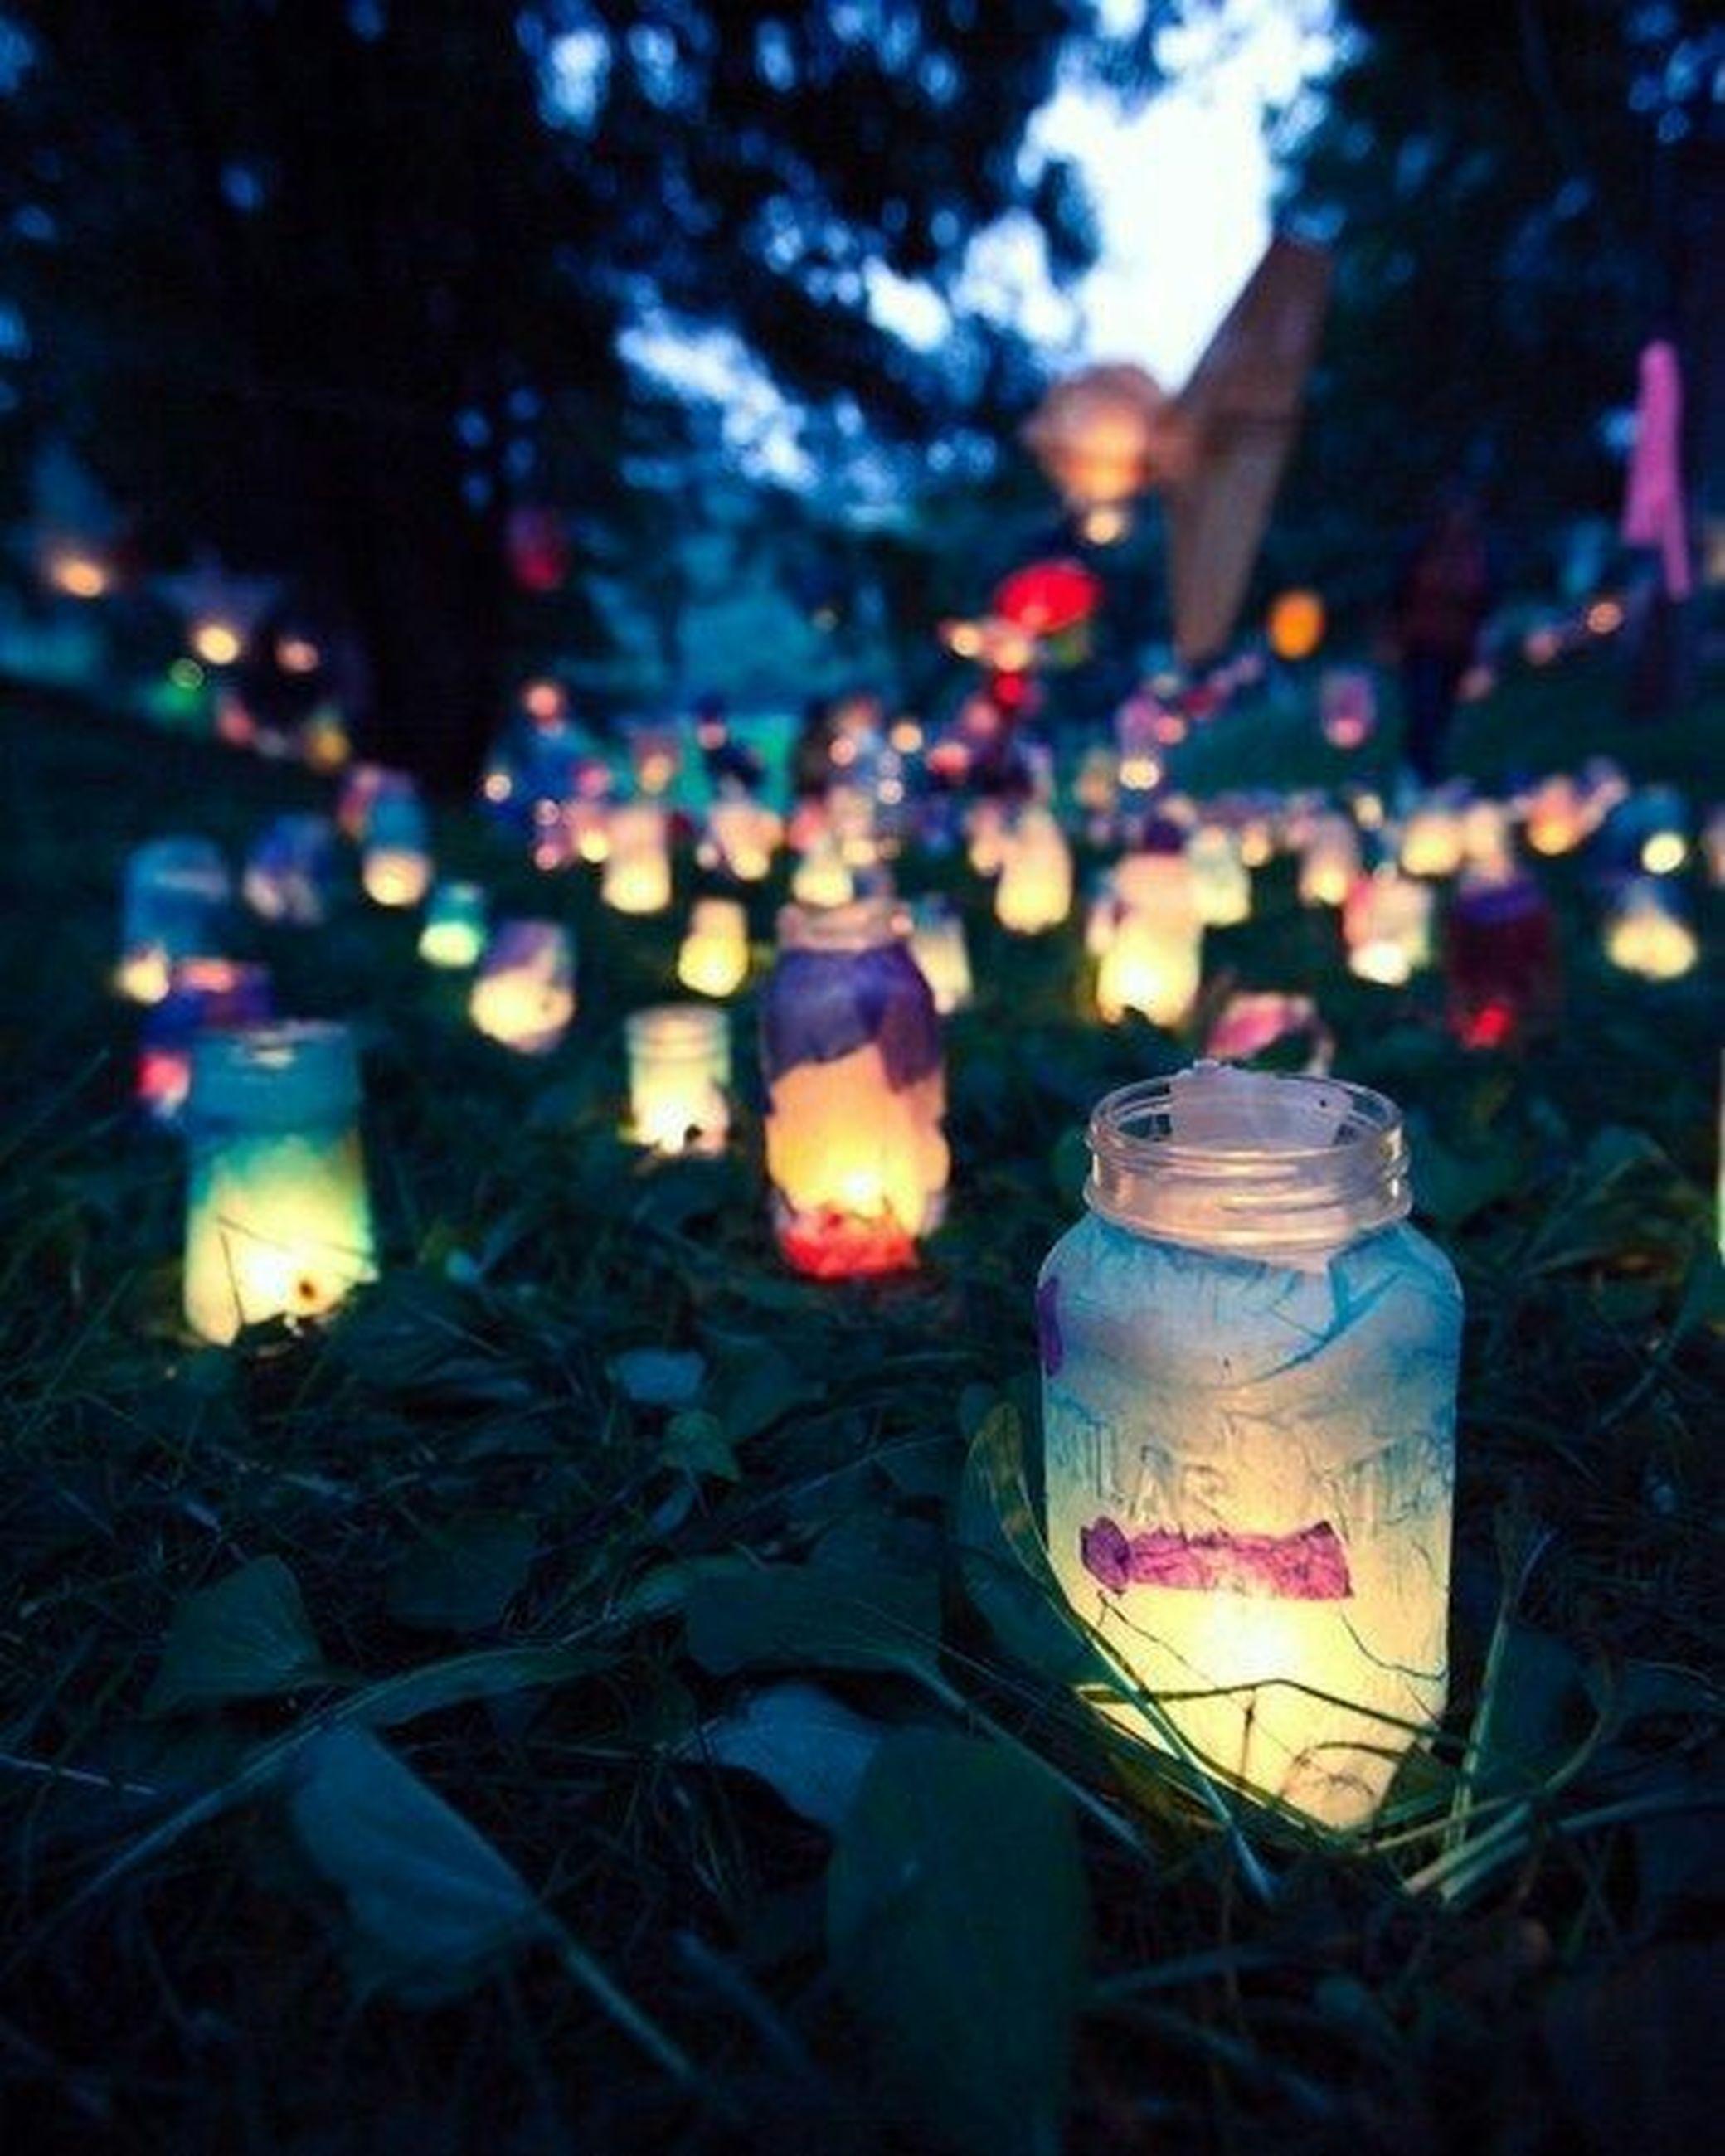 candle, illuminated, burning, flame, night, heat - temperature, no people, multi colored, outdoors, oil lamp, tea light